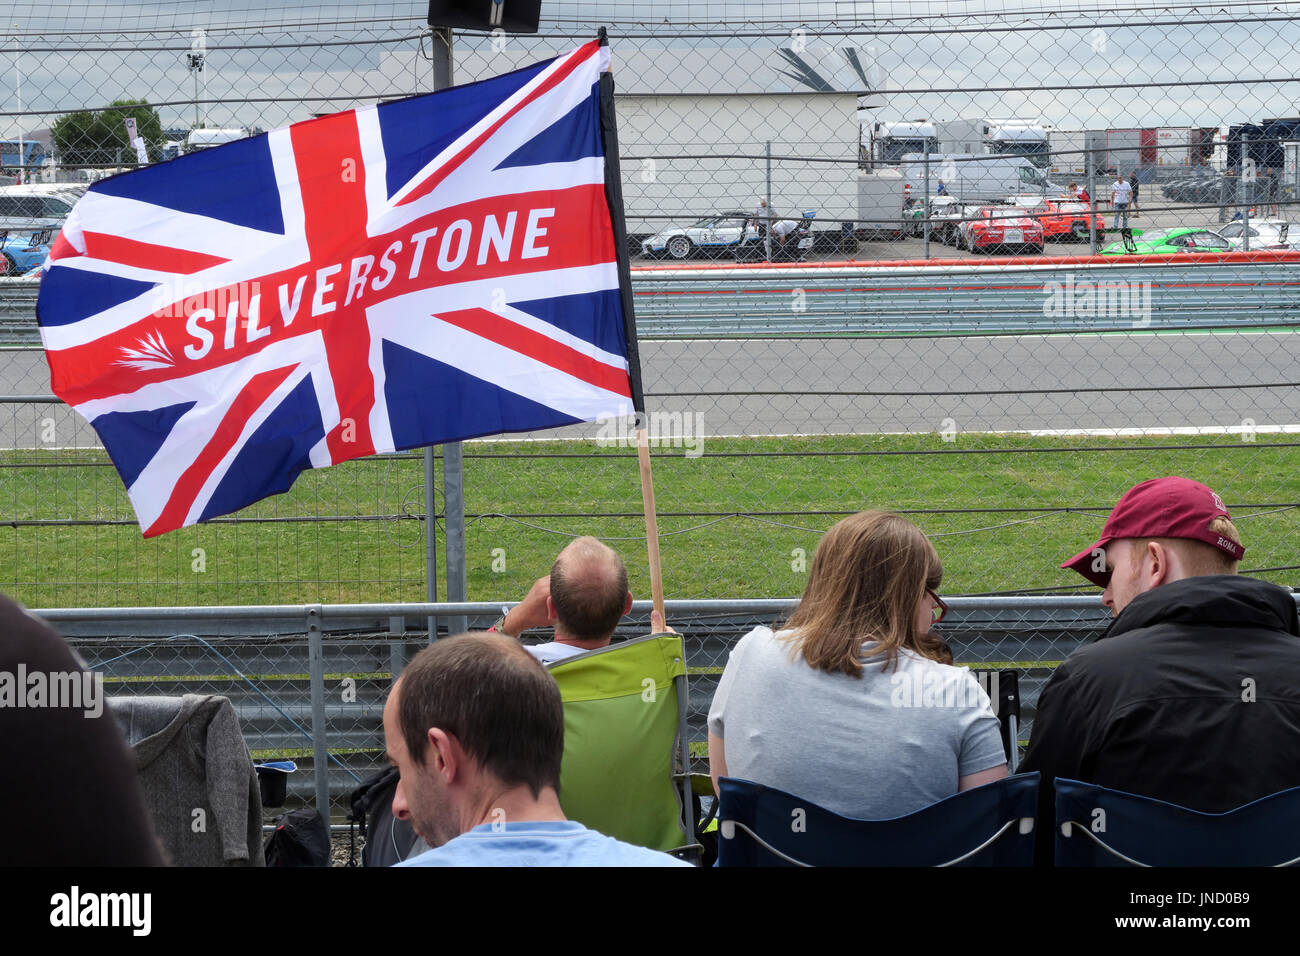 Flag,at,gotonysmith,july2017,fan,fans,seated,sitting,trackside